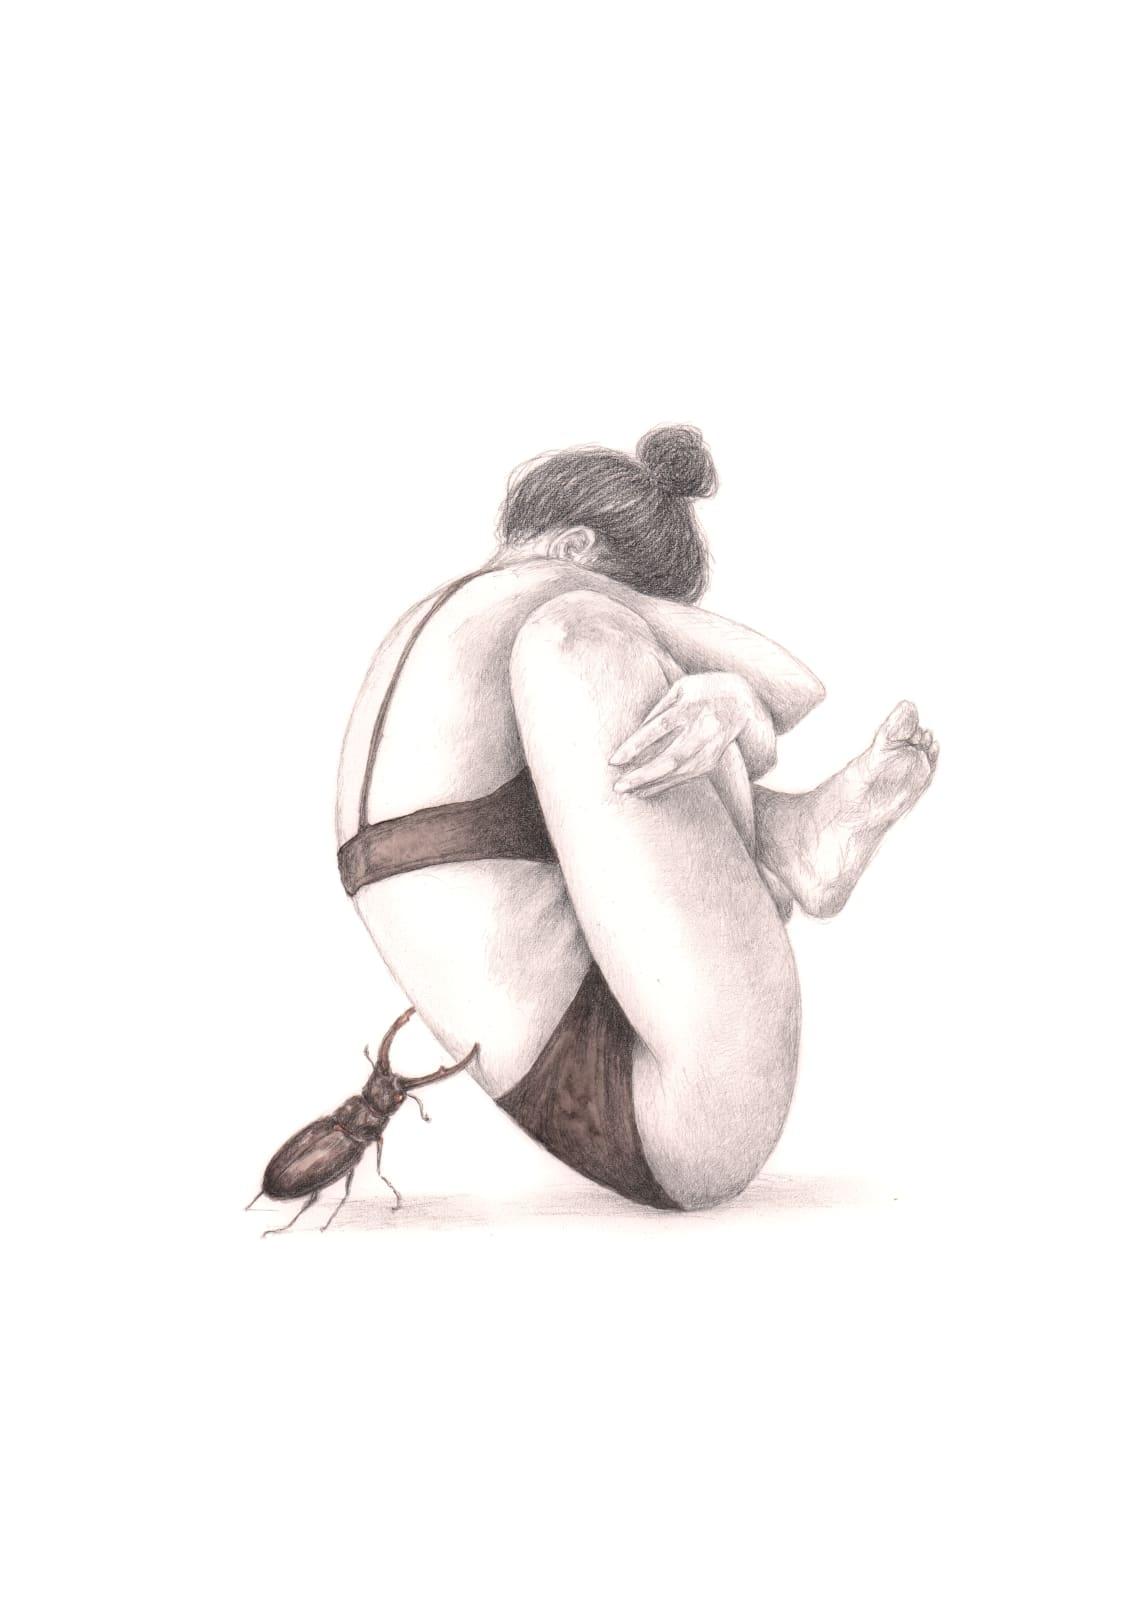 Rachel Goodyear, Stag Beetle, 2020